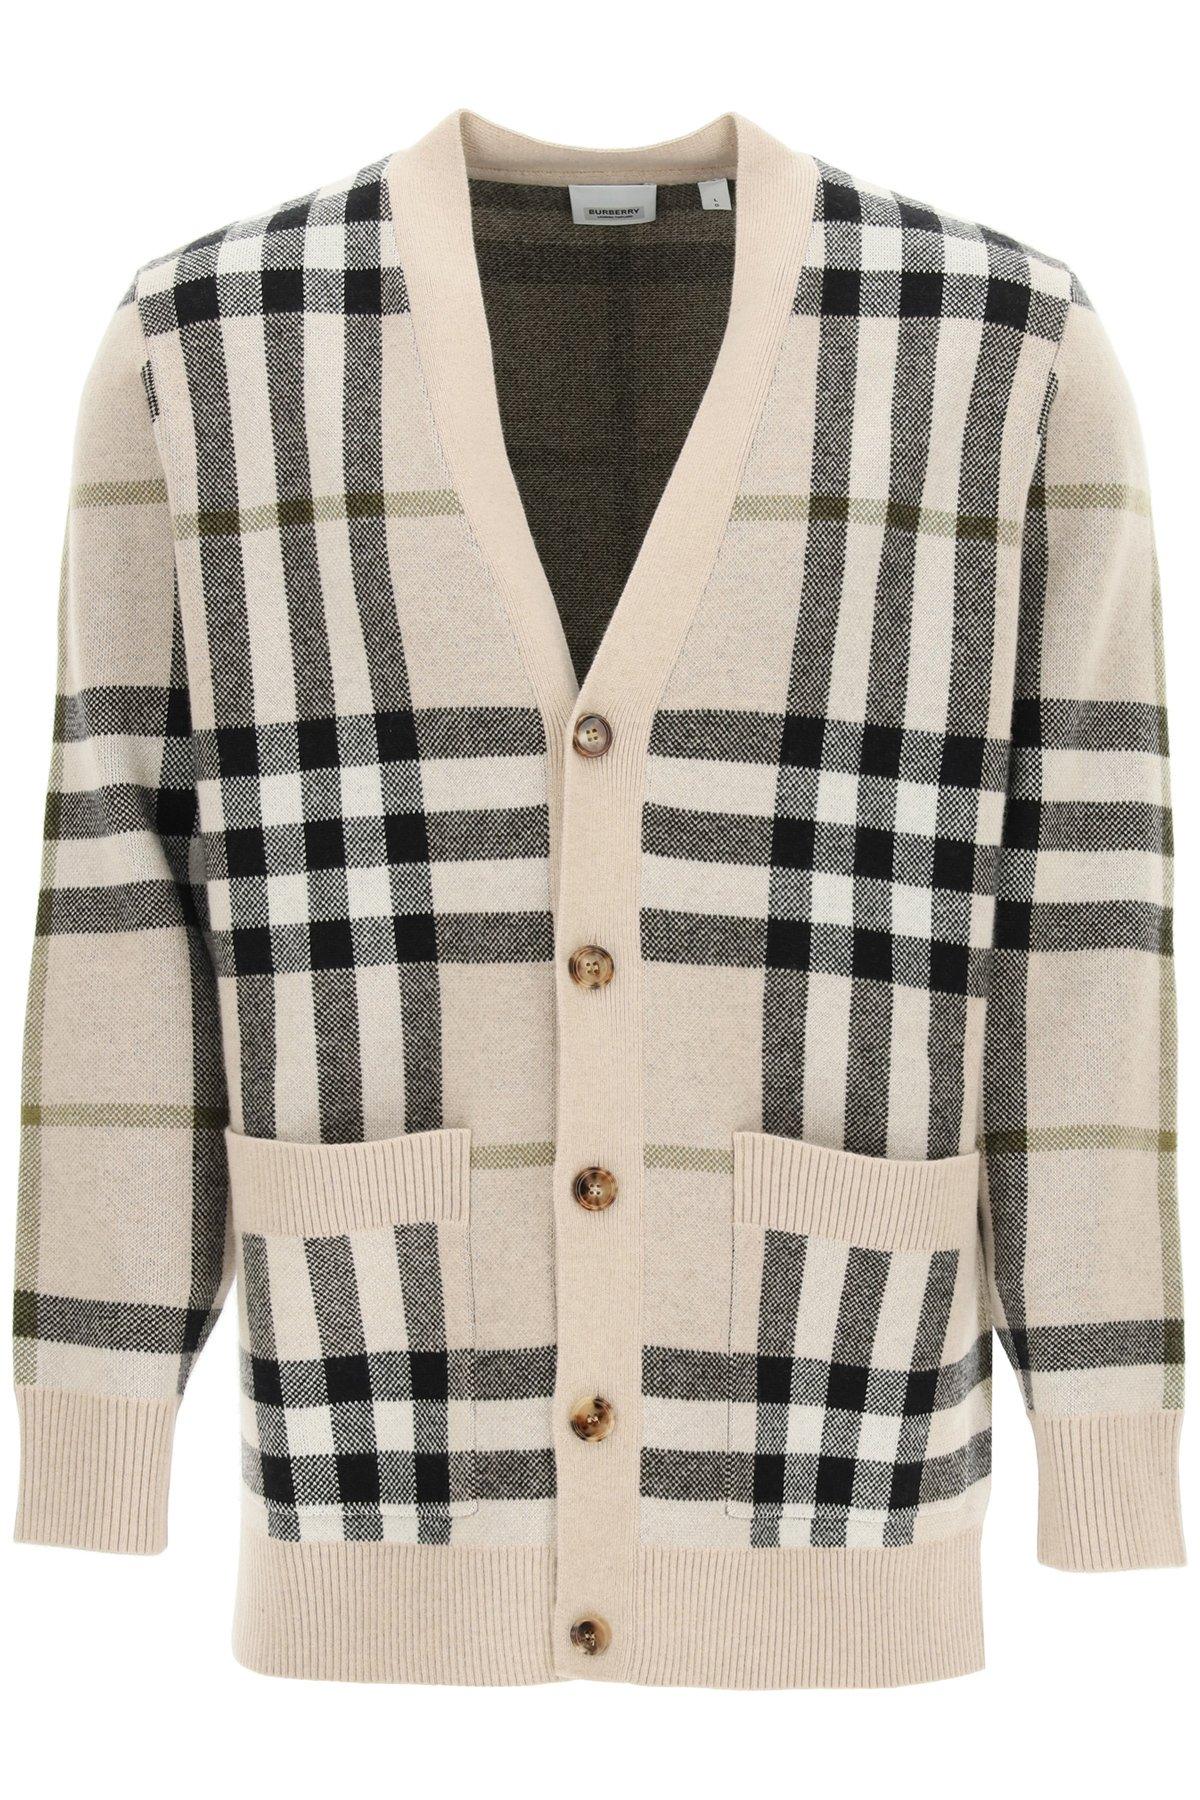 Burberry cardigan wilmore in lana e cashmere